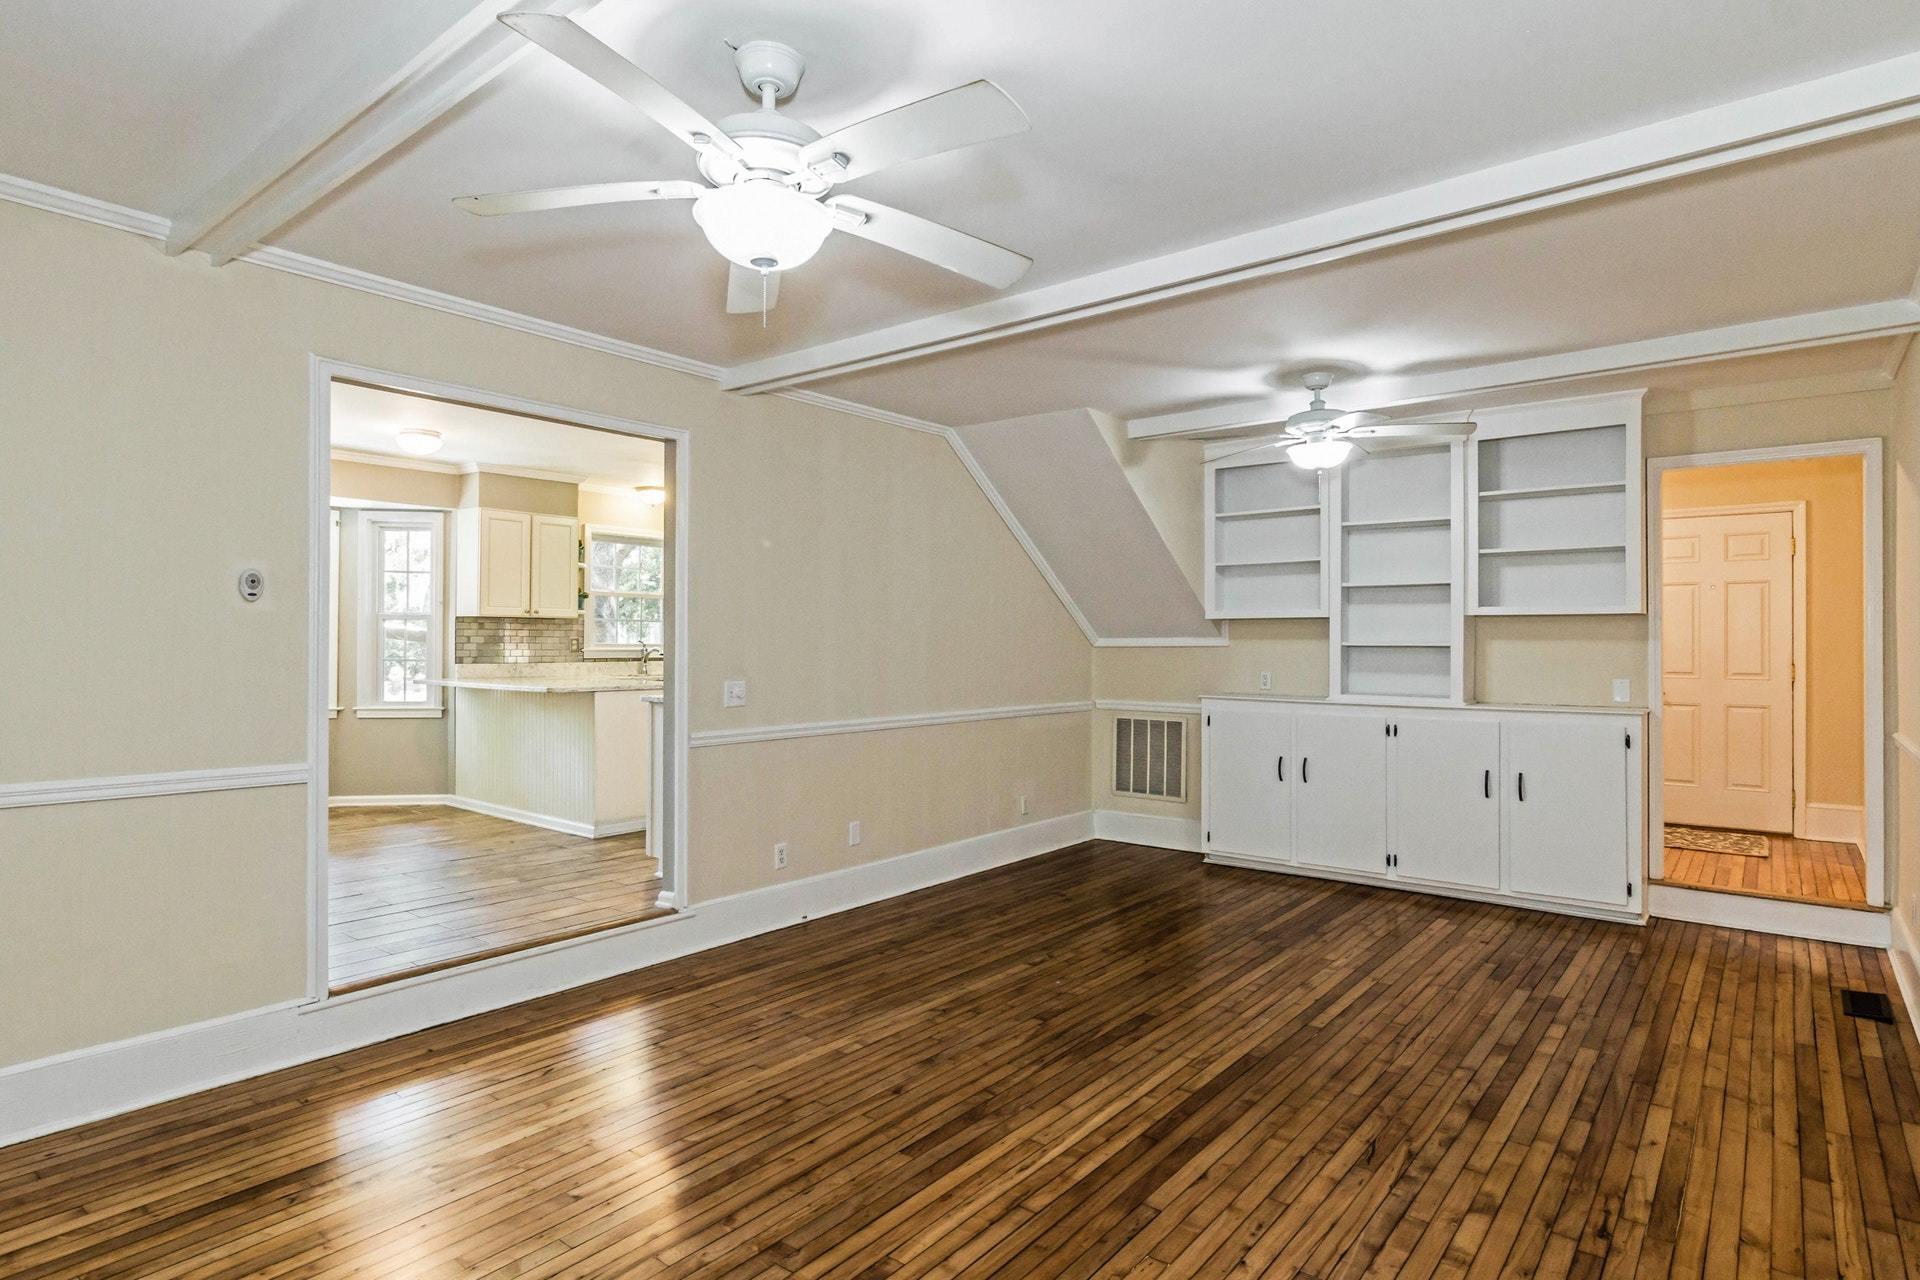 Shemwood II Homes For Sale - 969 Sea Gull, Mount Pleasant, SC - 23